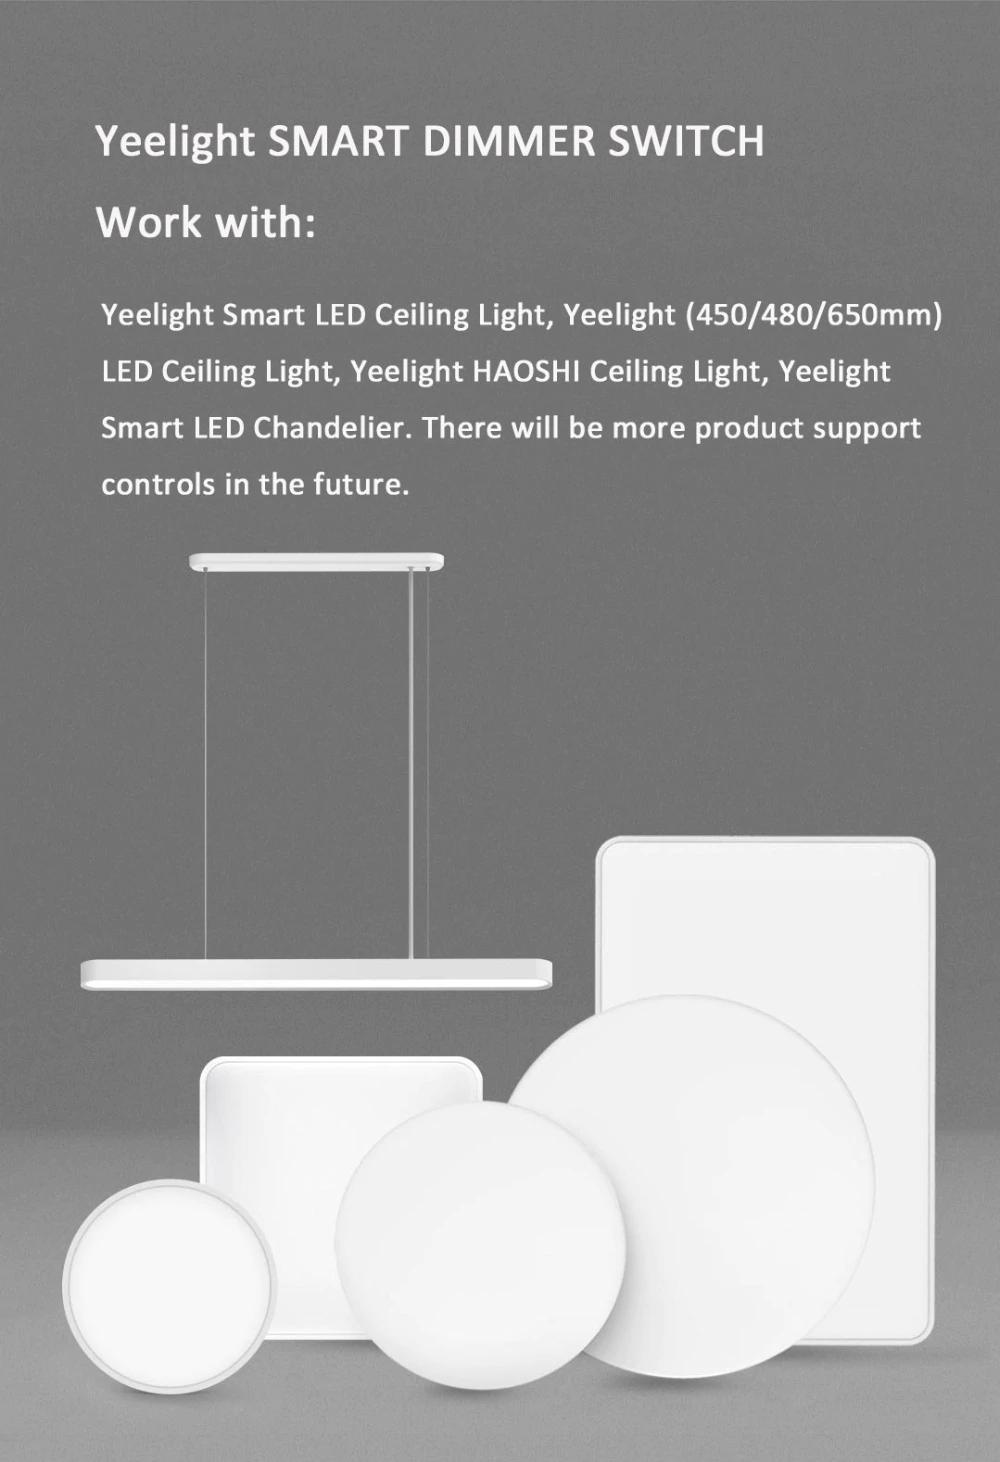 Xiaomi Yeelight Smart Dimmer Switch: Compatibilidad